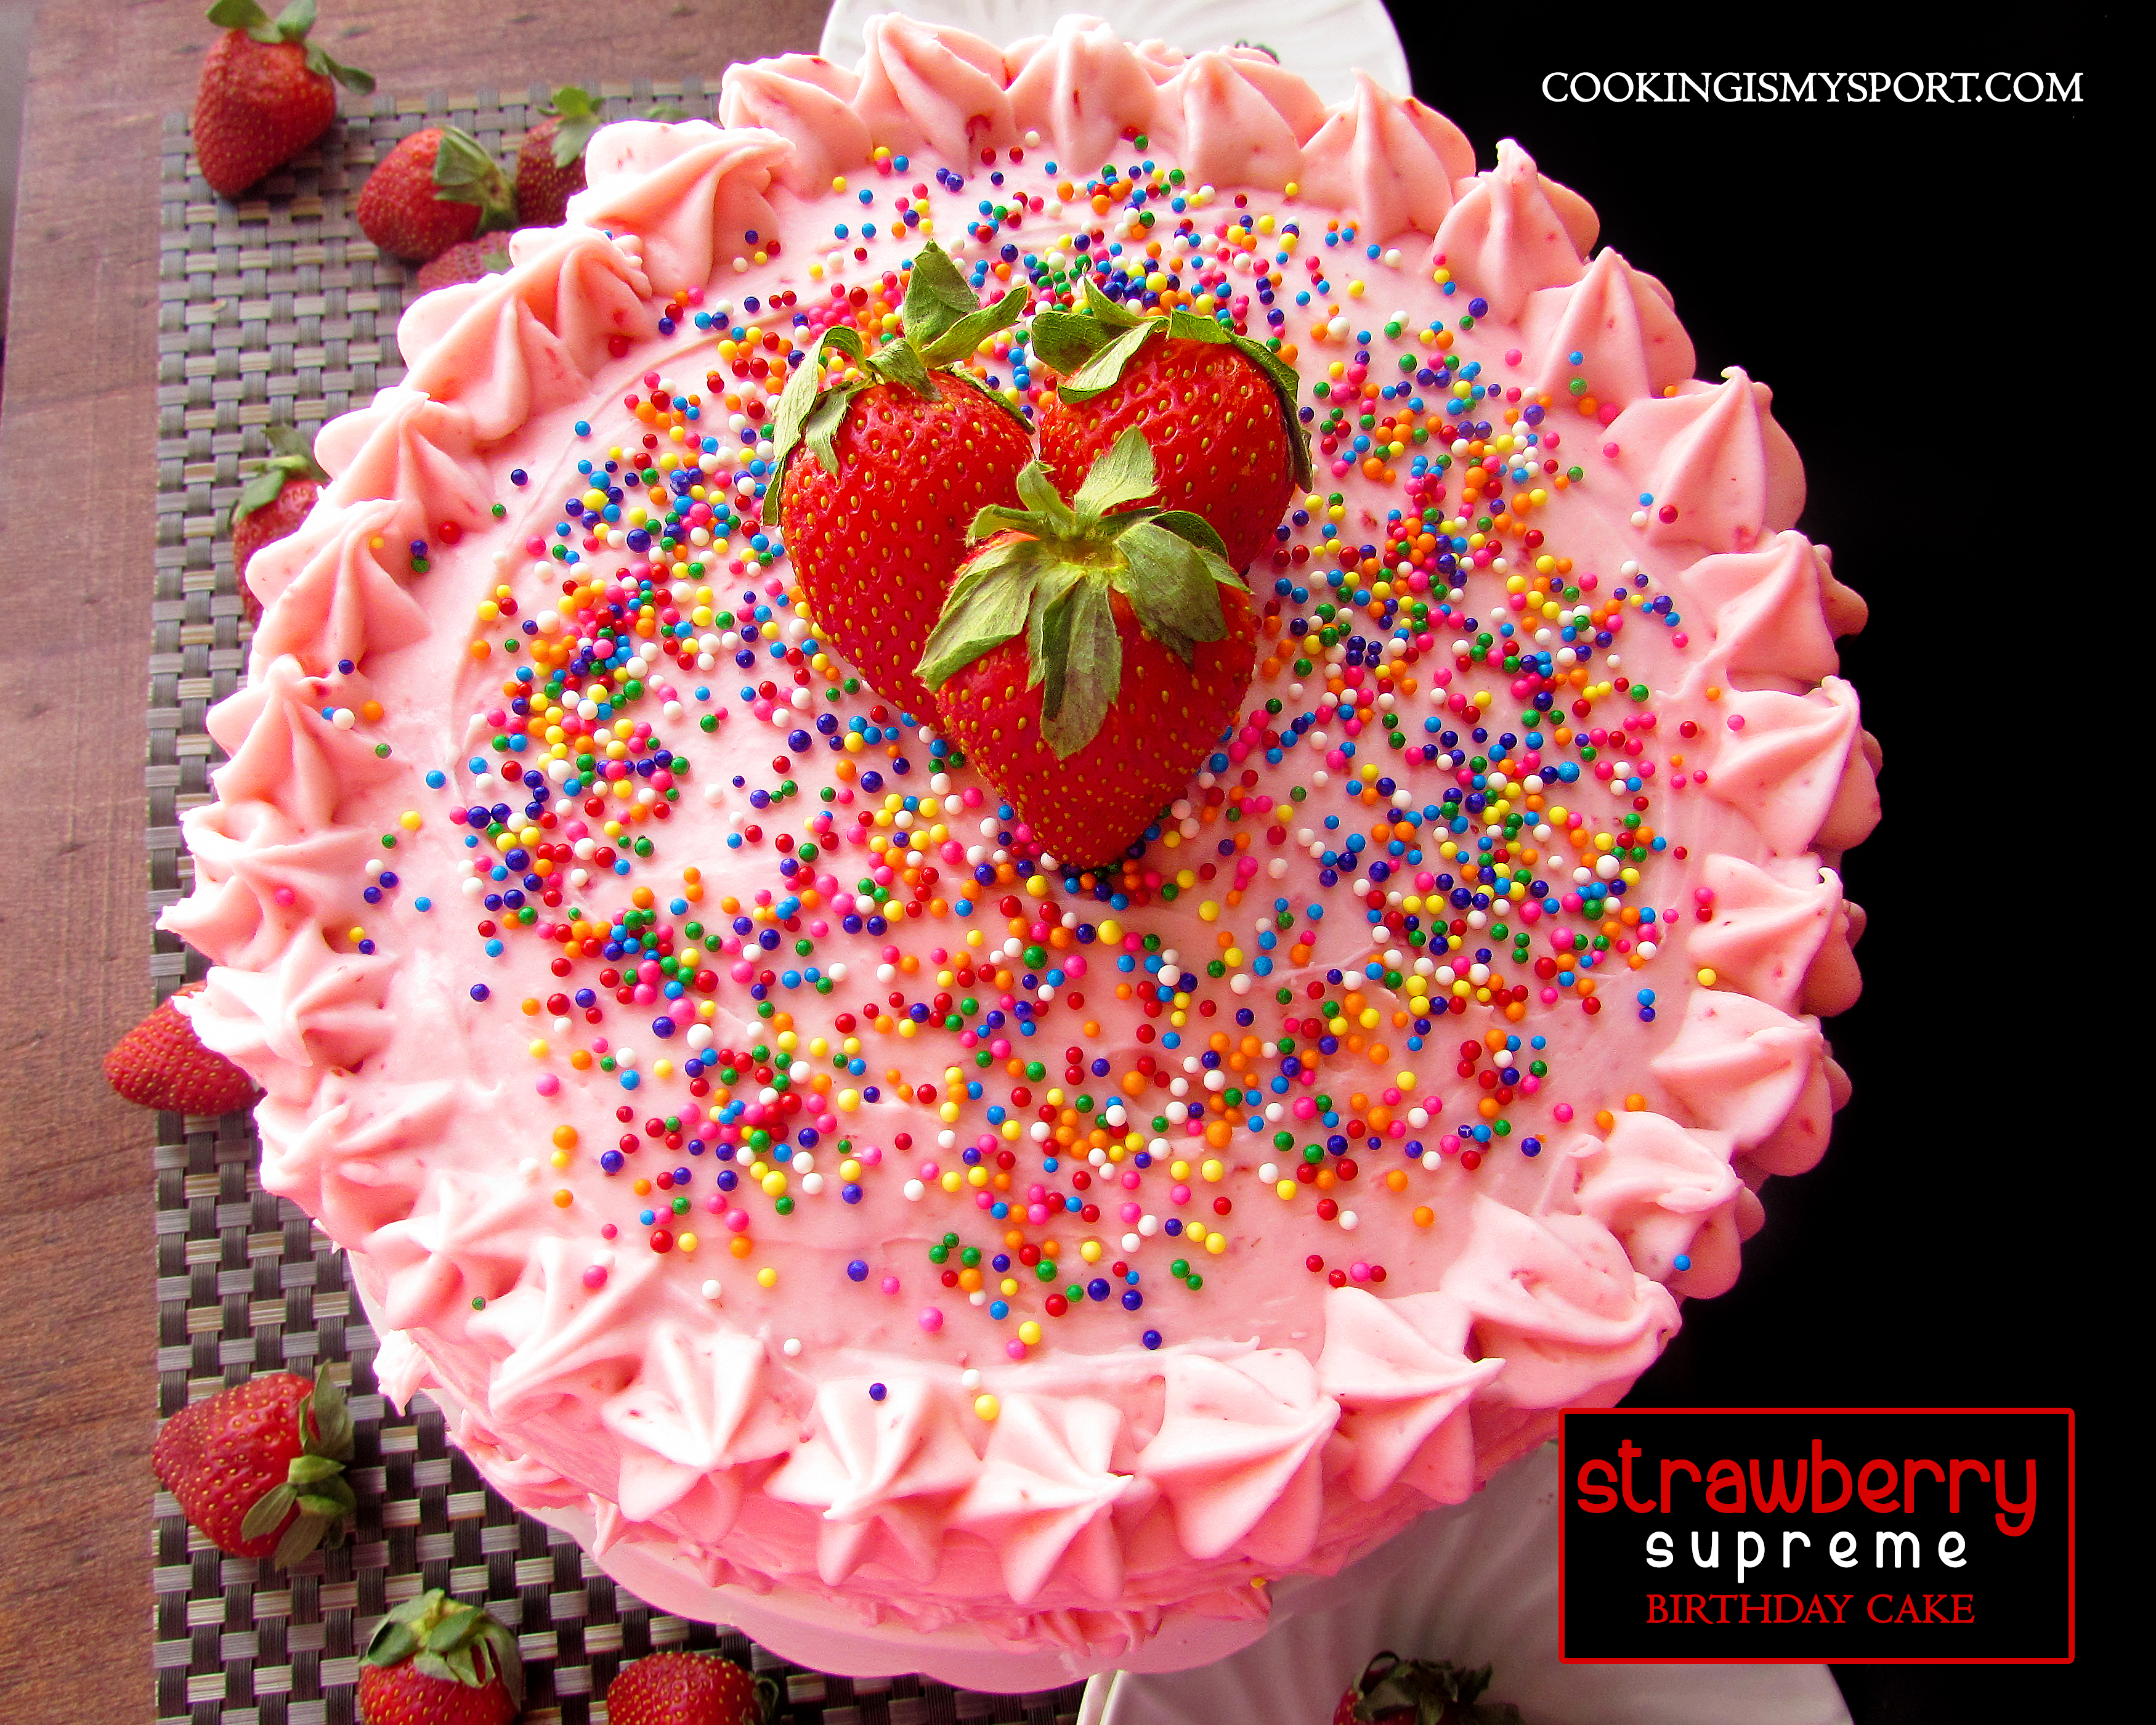 strawberry-supreme-birthday-cake1